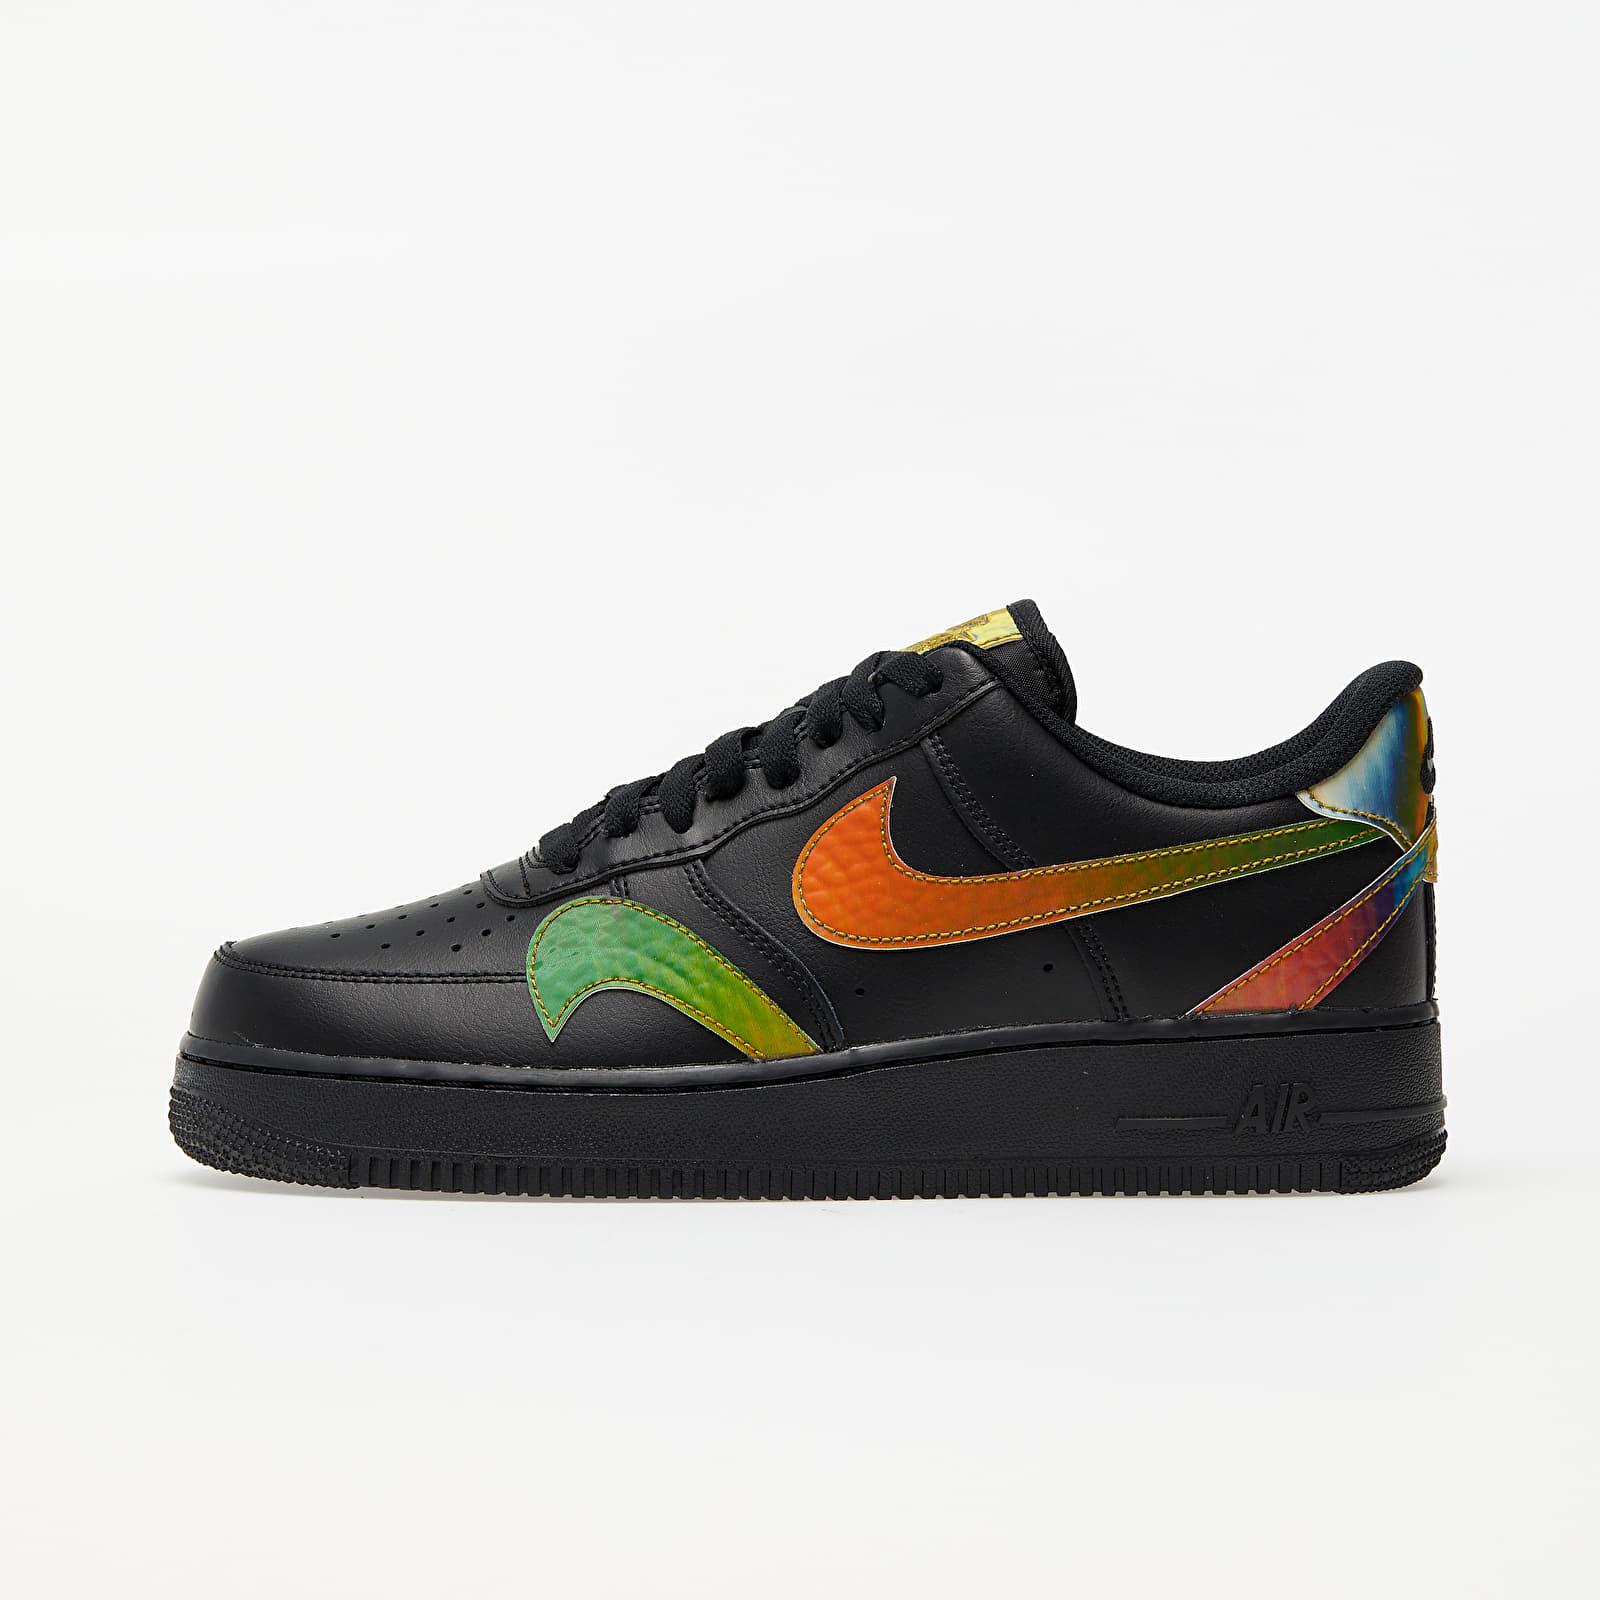 Nike Air Force 1 '07 LV8 Black/ Multi-Color-Black CK7214-001